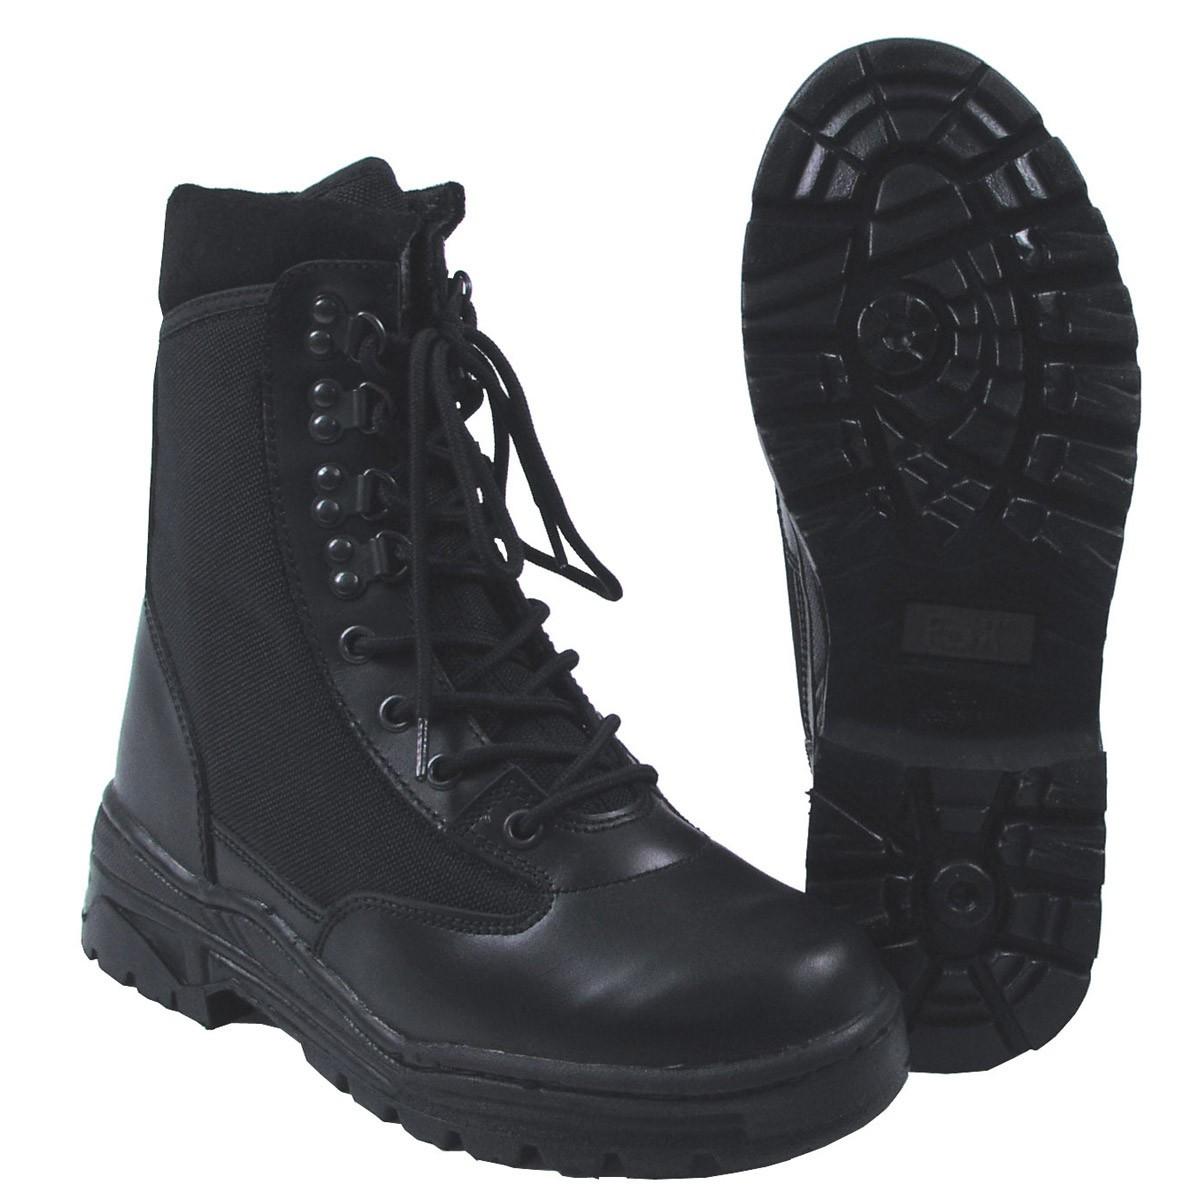 Taktični čevlji MFH Fox Adventure 18783A